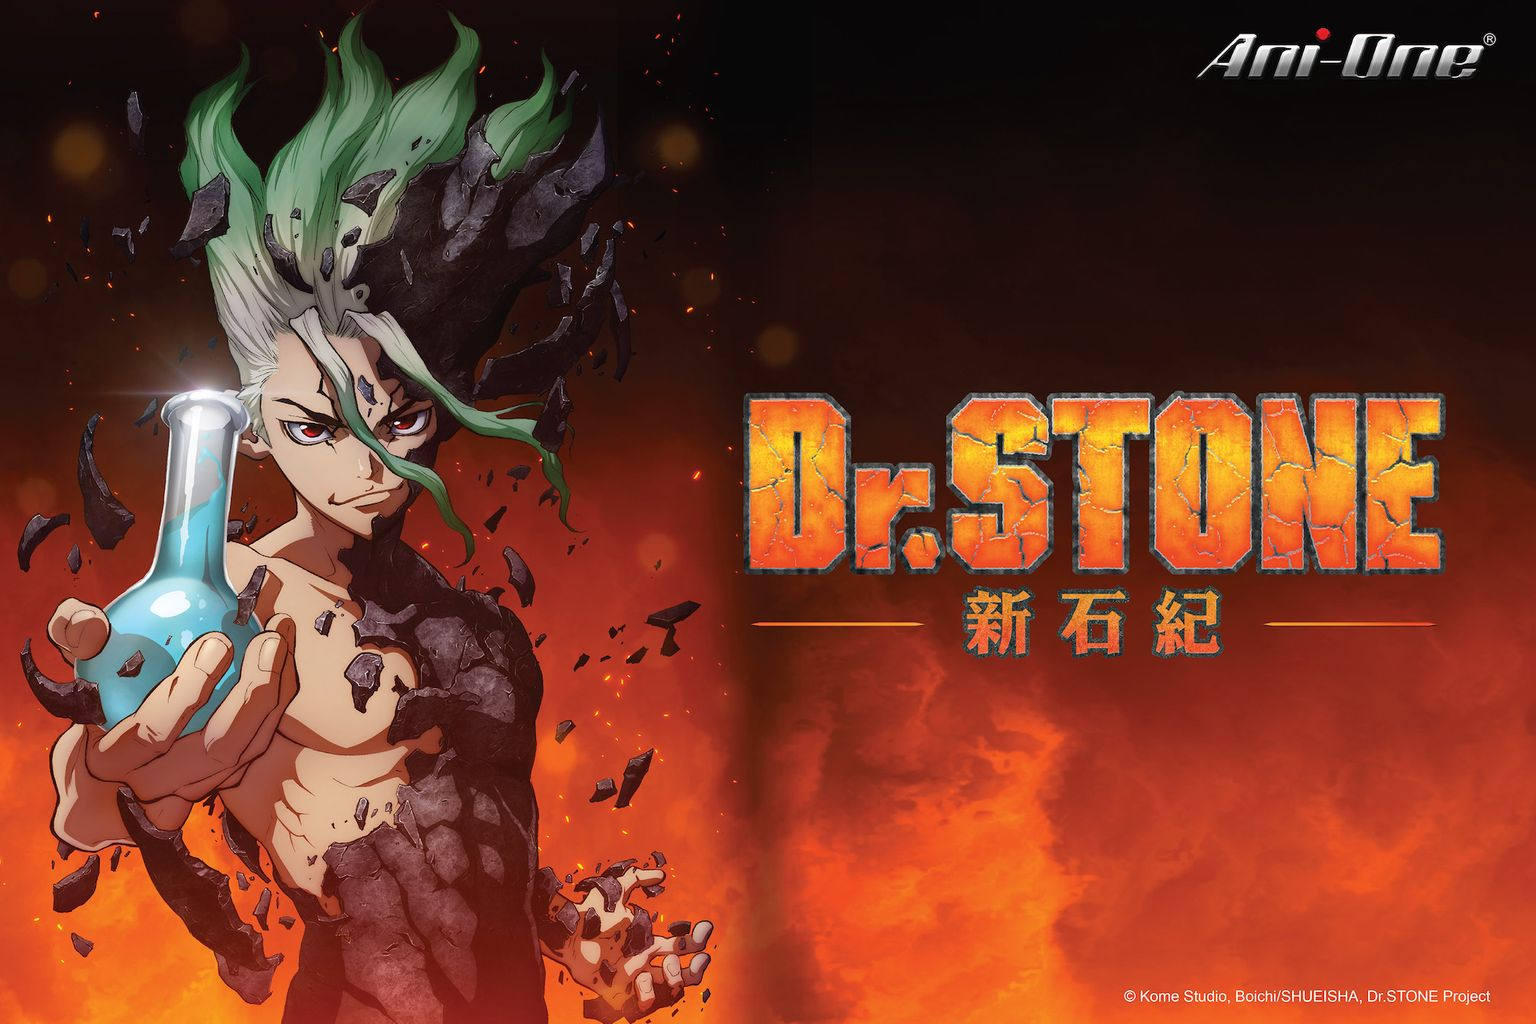 Dr.STONE 新石紀-免費線上看 第4集 ANI-ONE LINE TV-精彩隨看